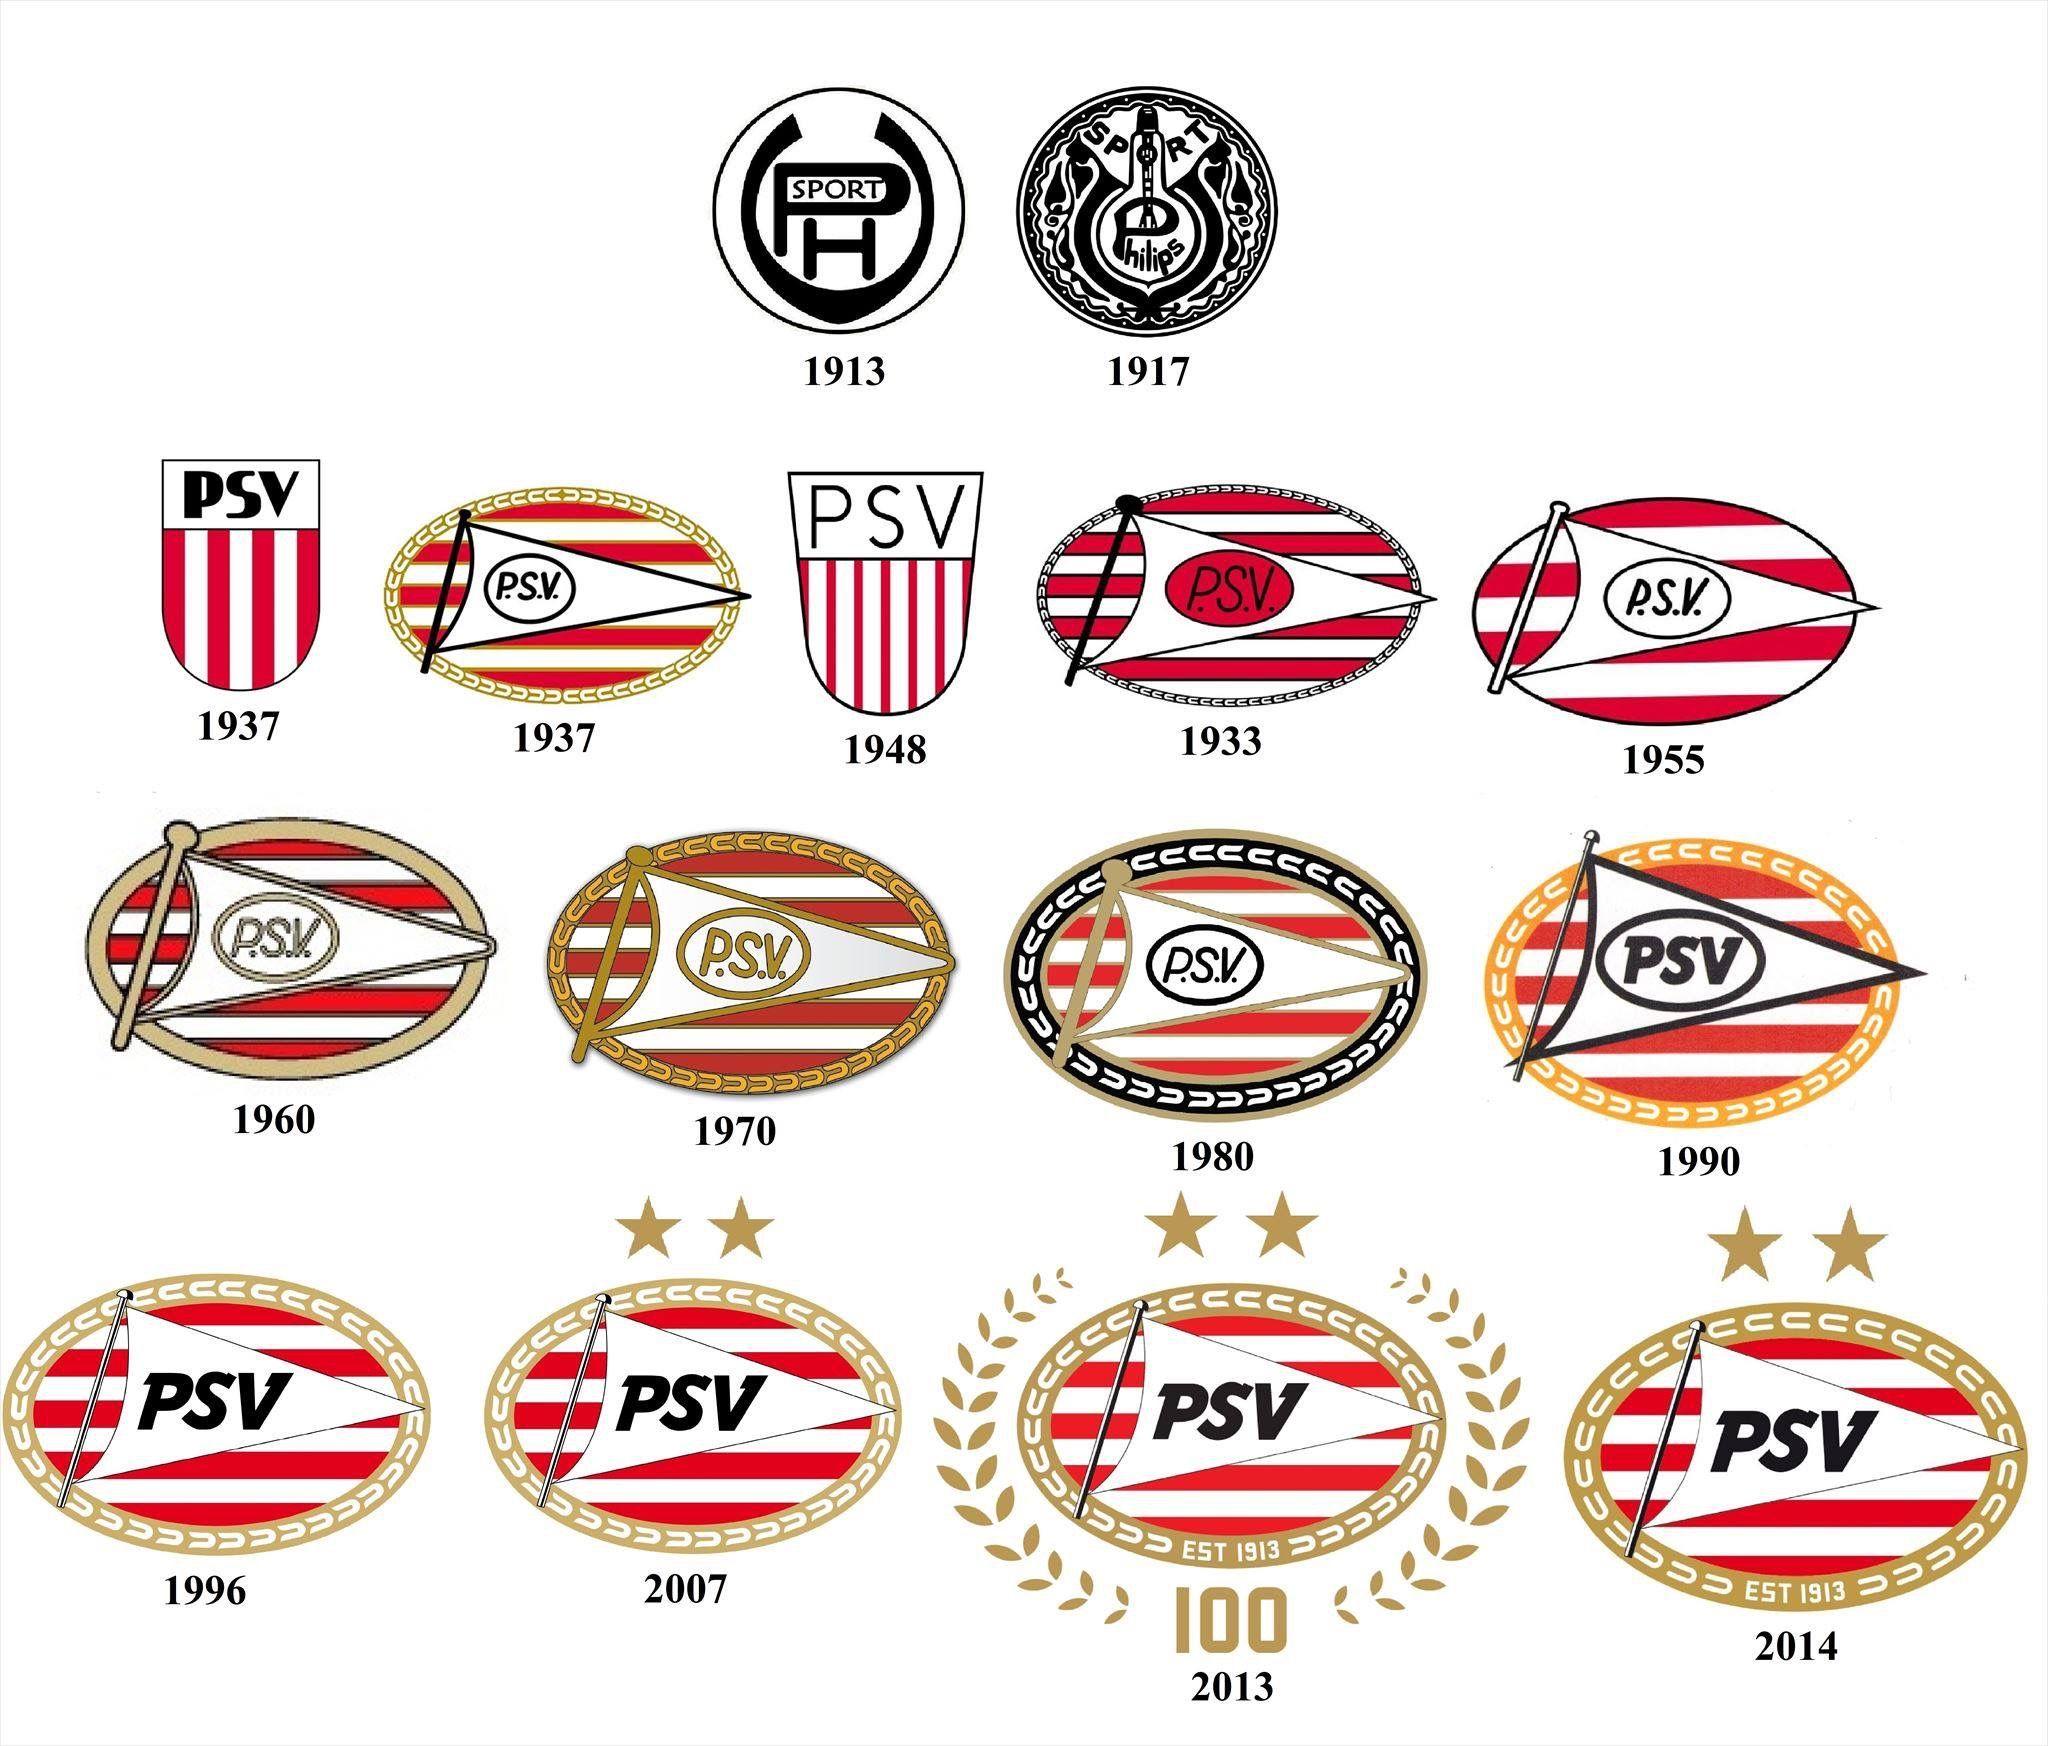 Pin de Vanja Vasiljević em Panini stickers Futebol